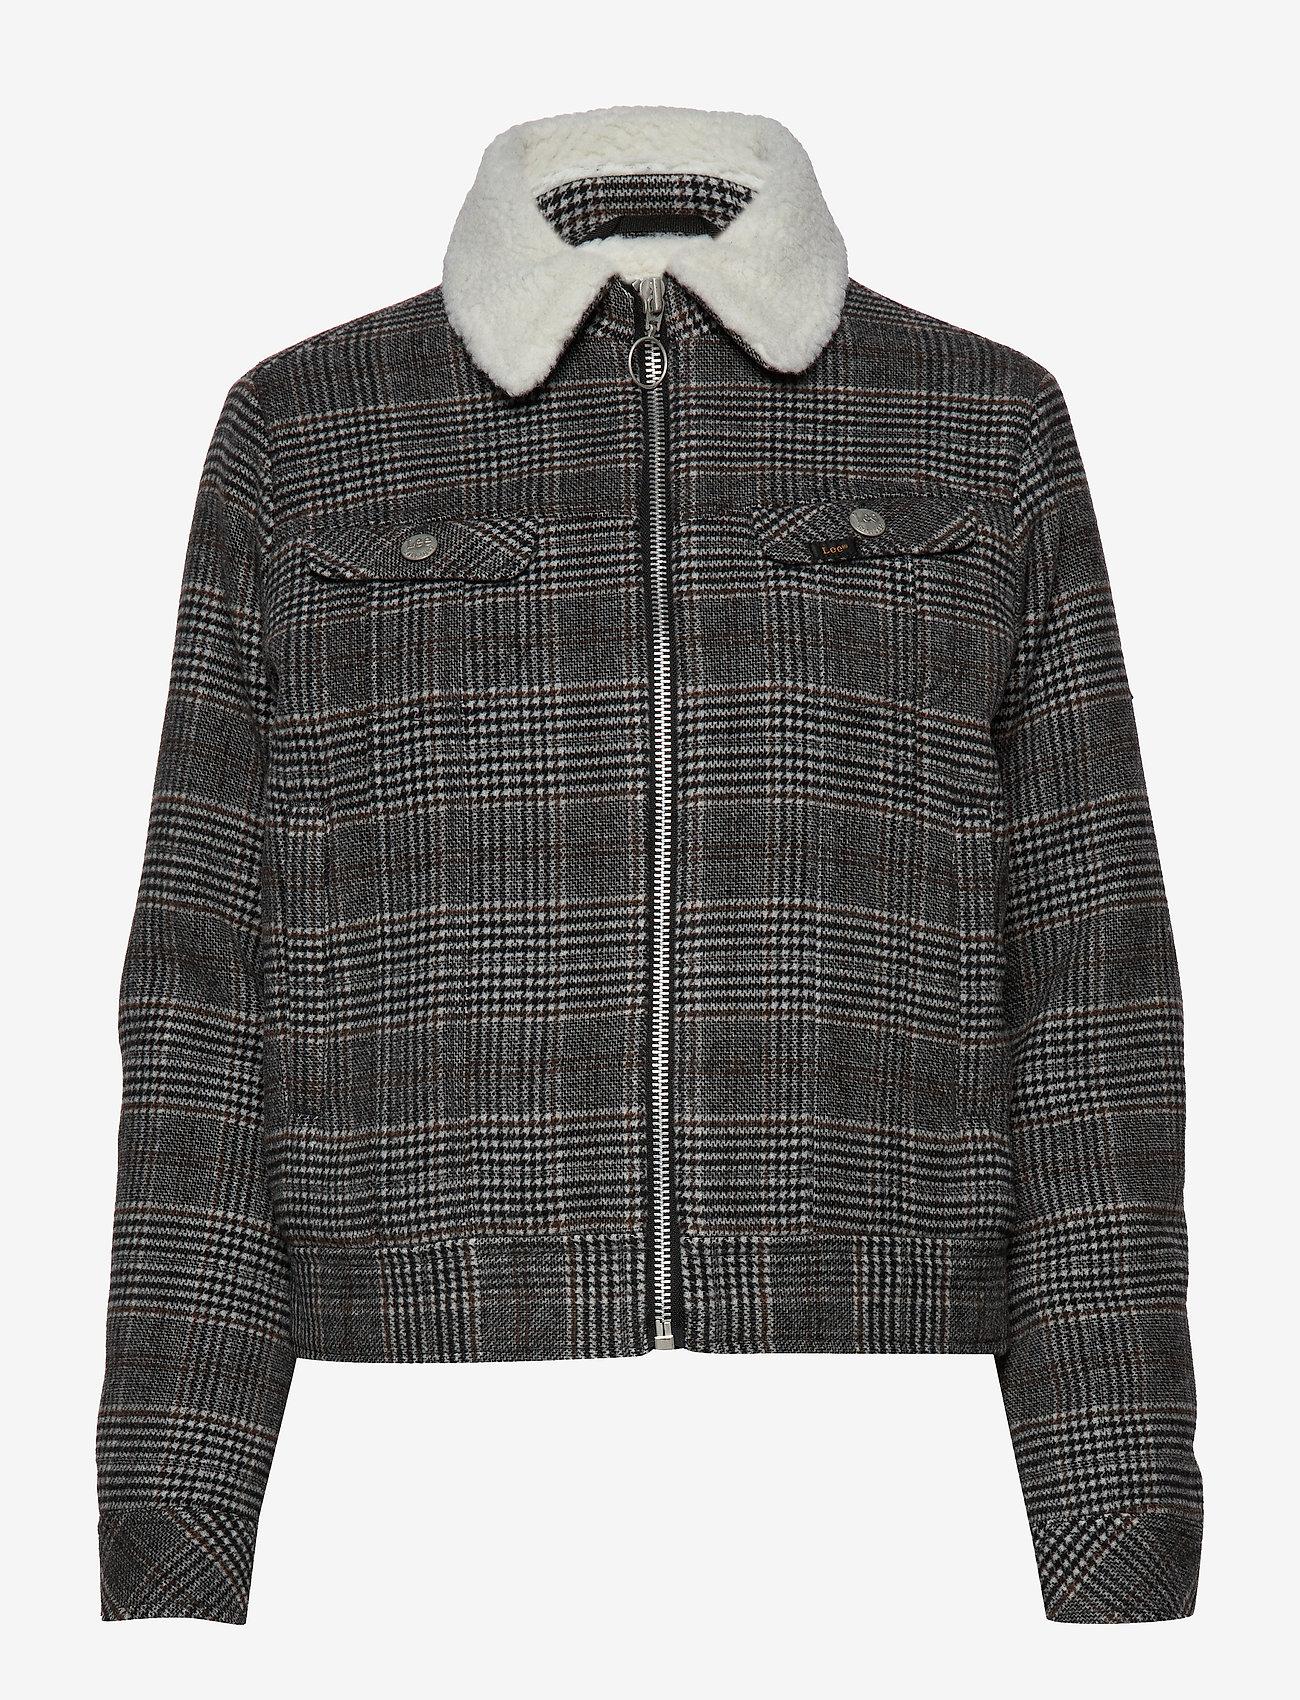 Lee Jeans - WOOL CHECK SHERPA JK - wełniane kurtki - khaki - 0